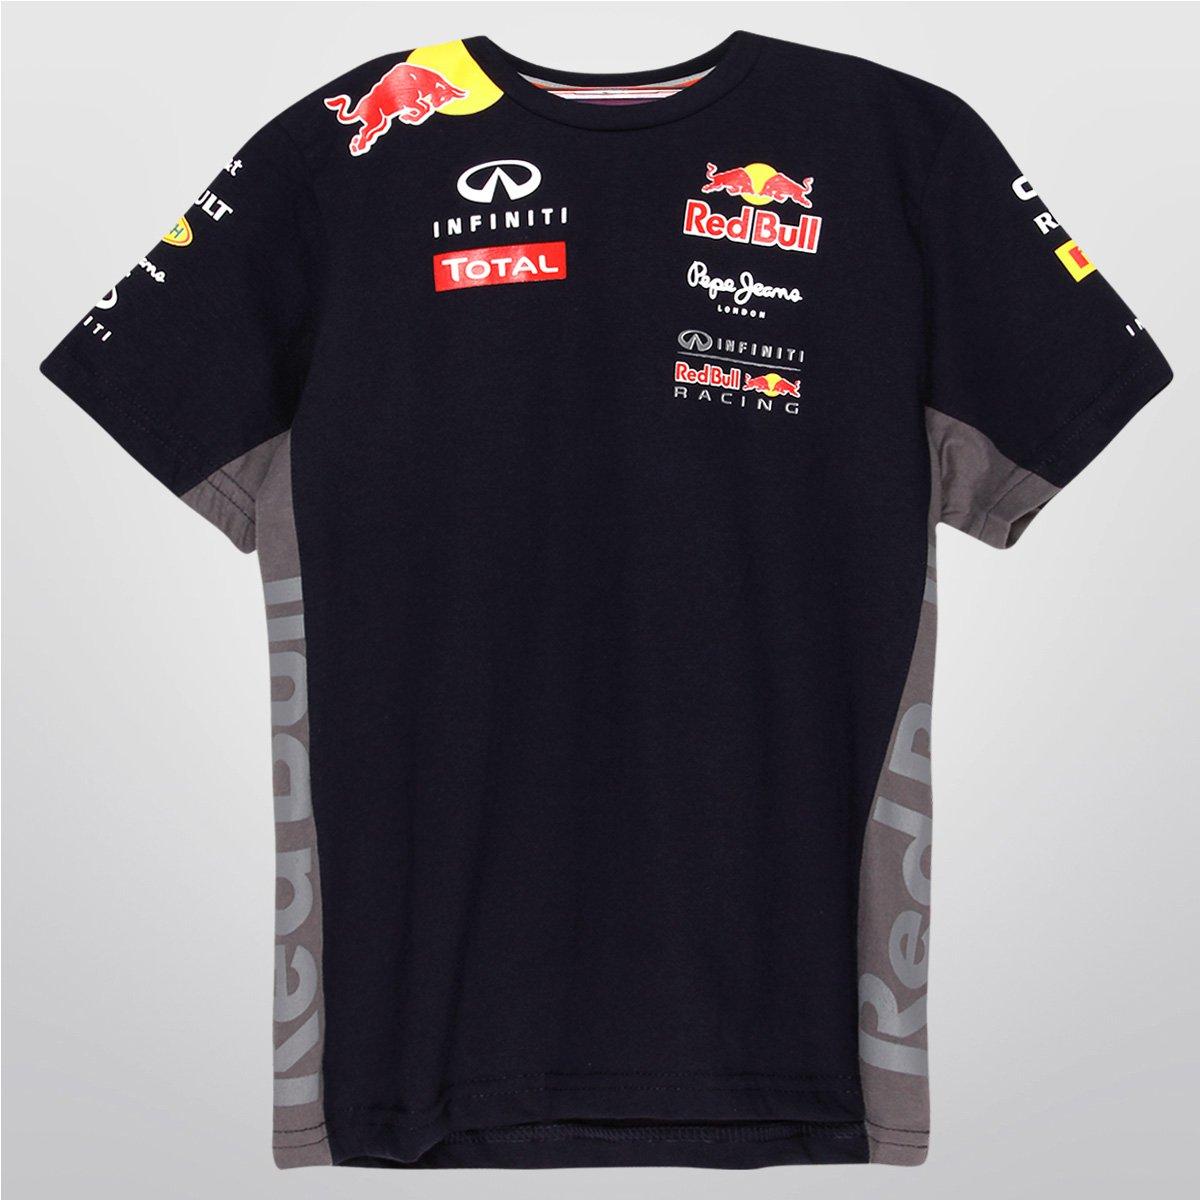 Camiseta Infiniti Red Bull Racing Teamwear 2015 Infantil - Compre Agora  c3dc079db96